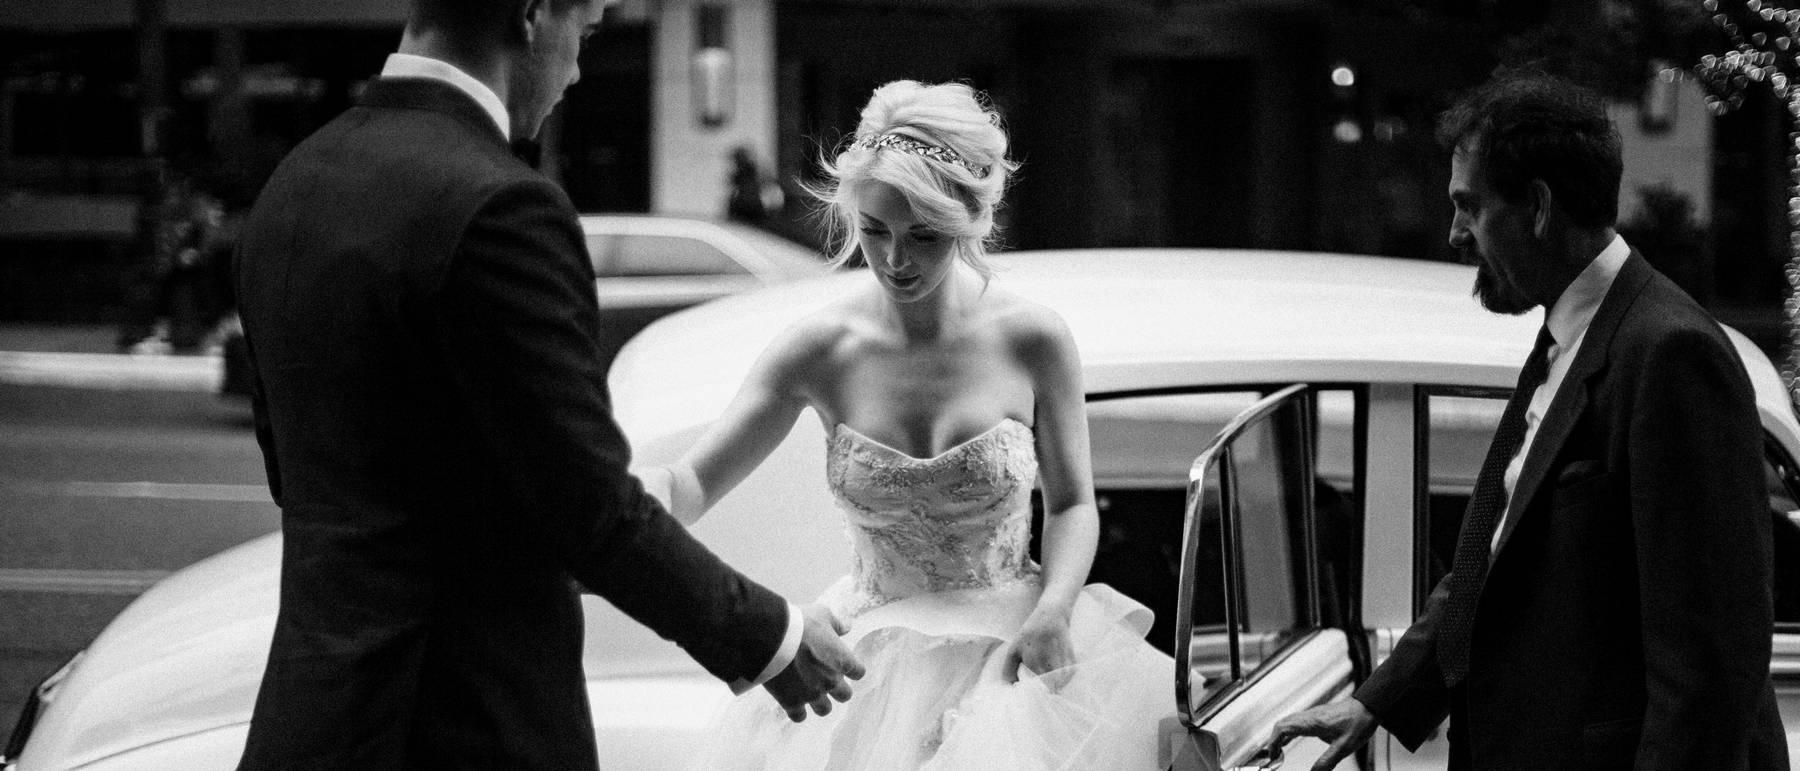 johnandjoseph-wedding-photographer-hz-slider-217